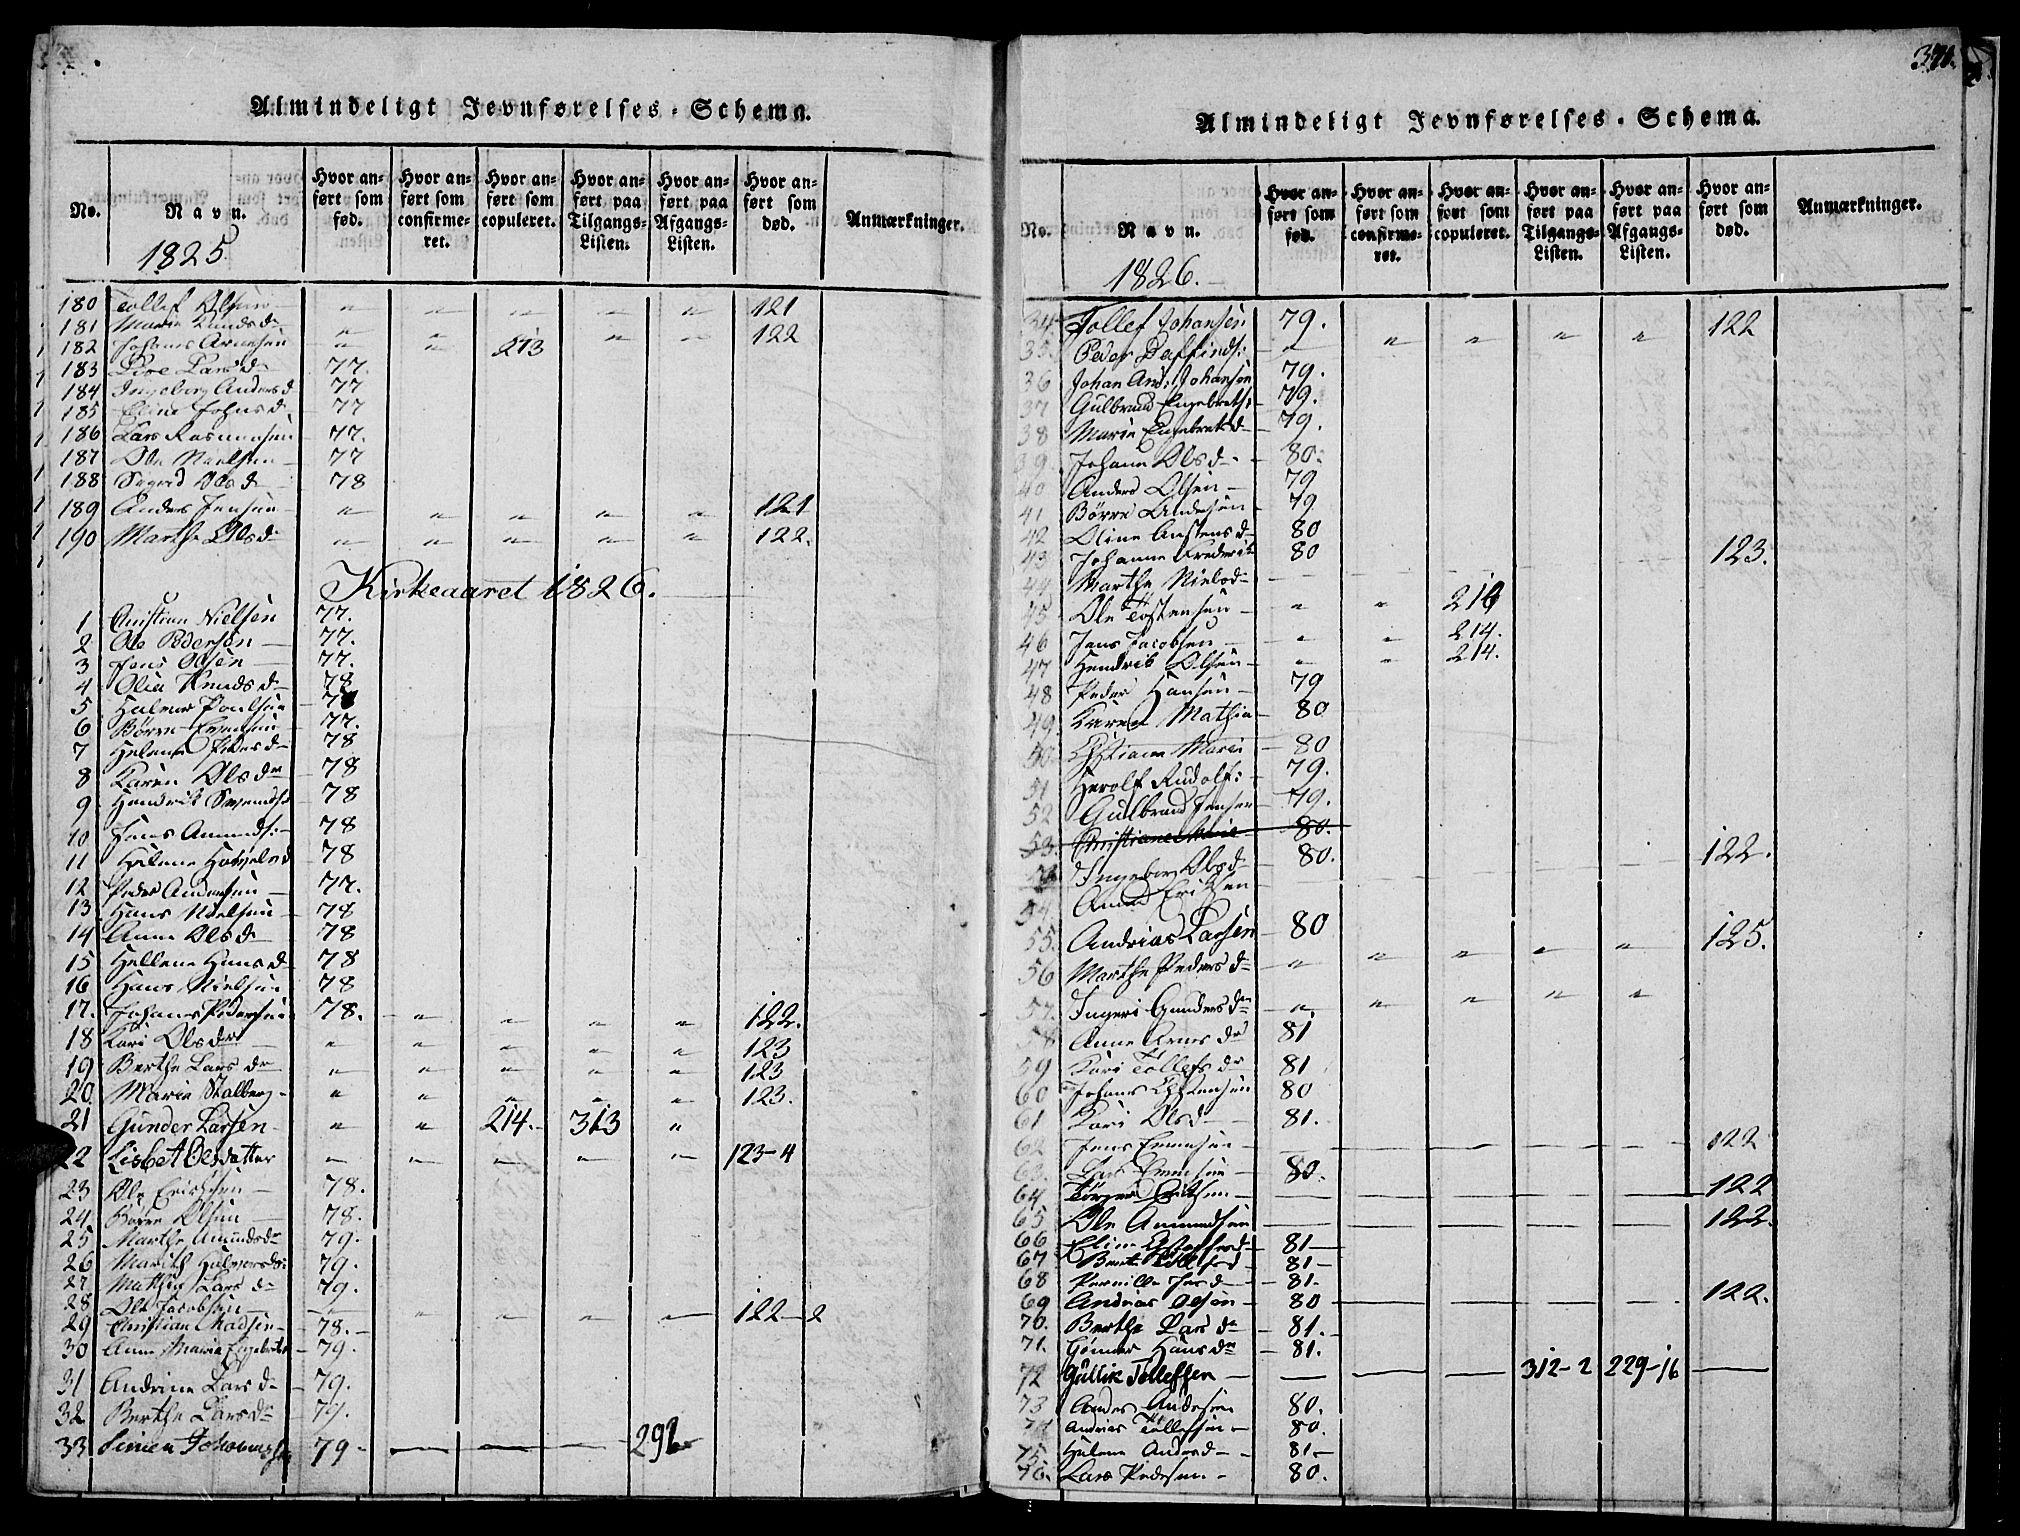 SAH, Biri prestekontor, Ministerialbok nr. 3, 1814-1828, s. 371